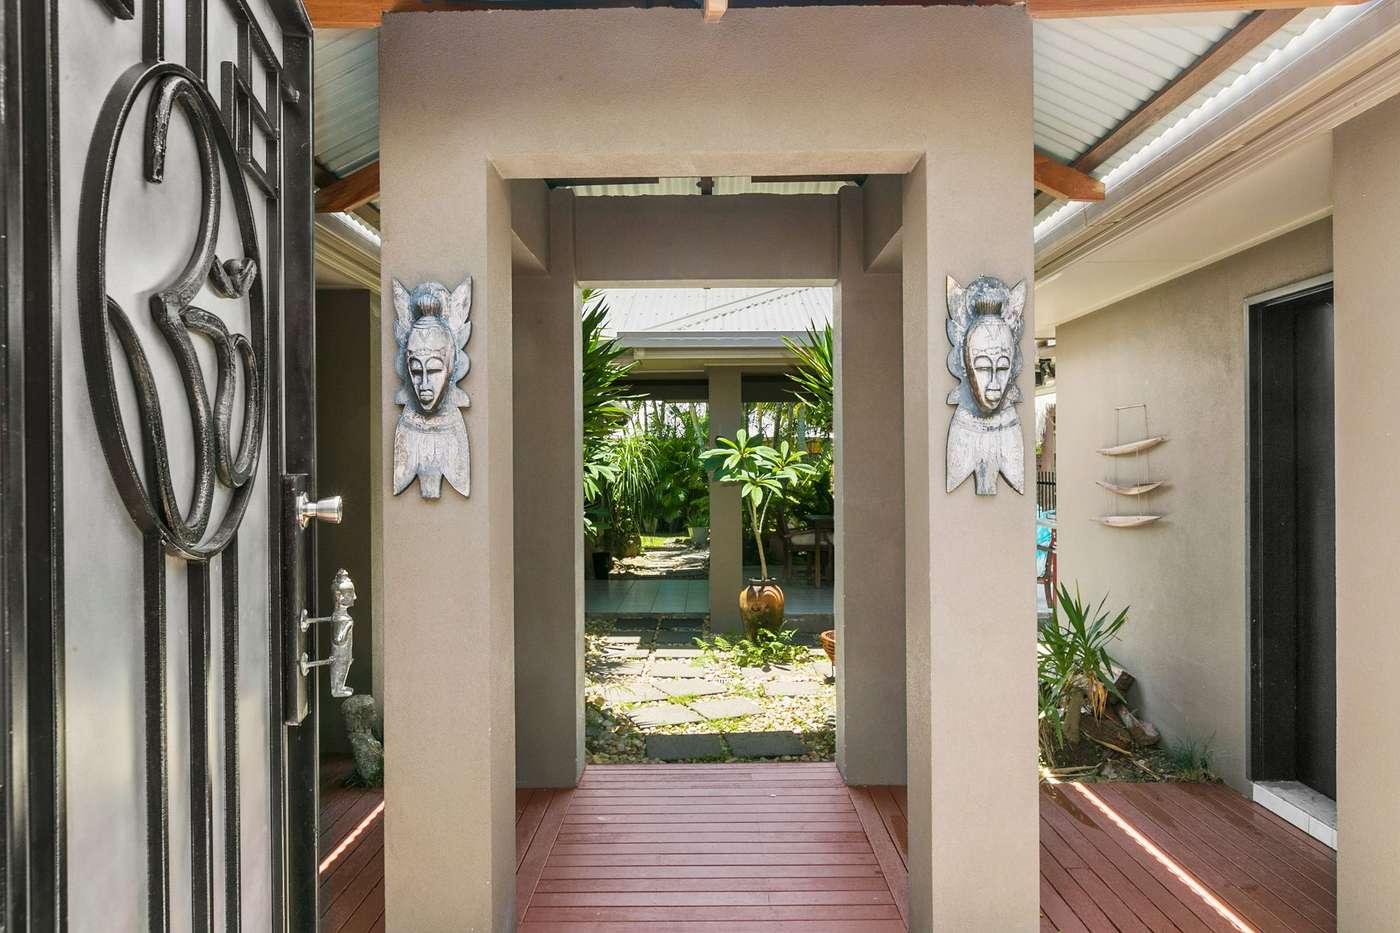 Main view of Homely house listing, 13 Teewah Close, Kewarra Beach, QLD 4879